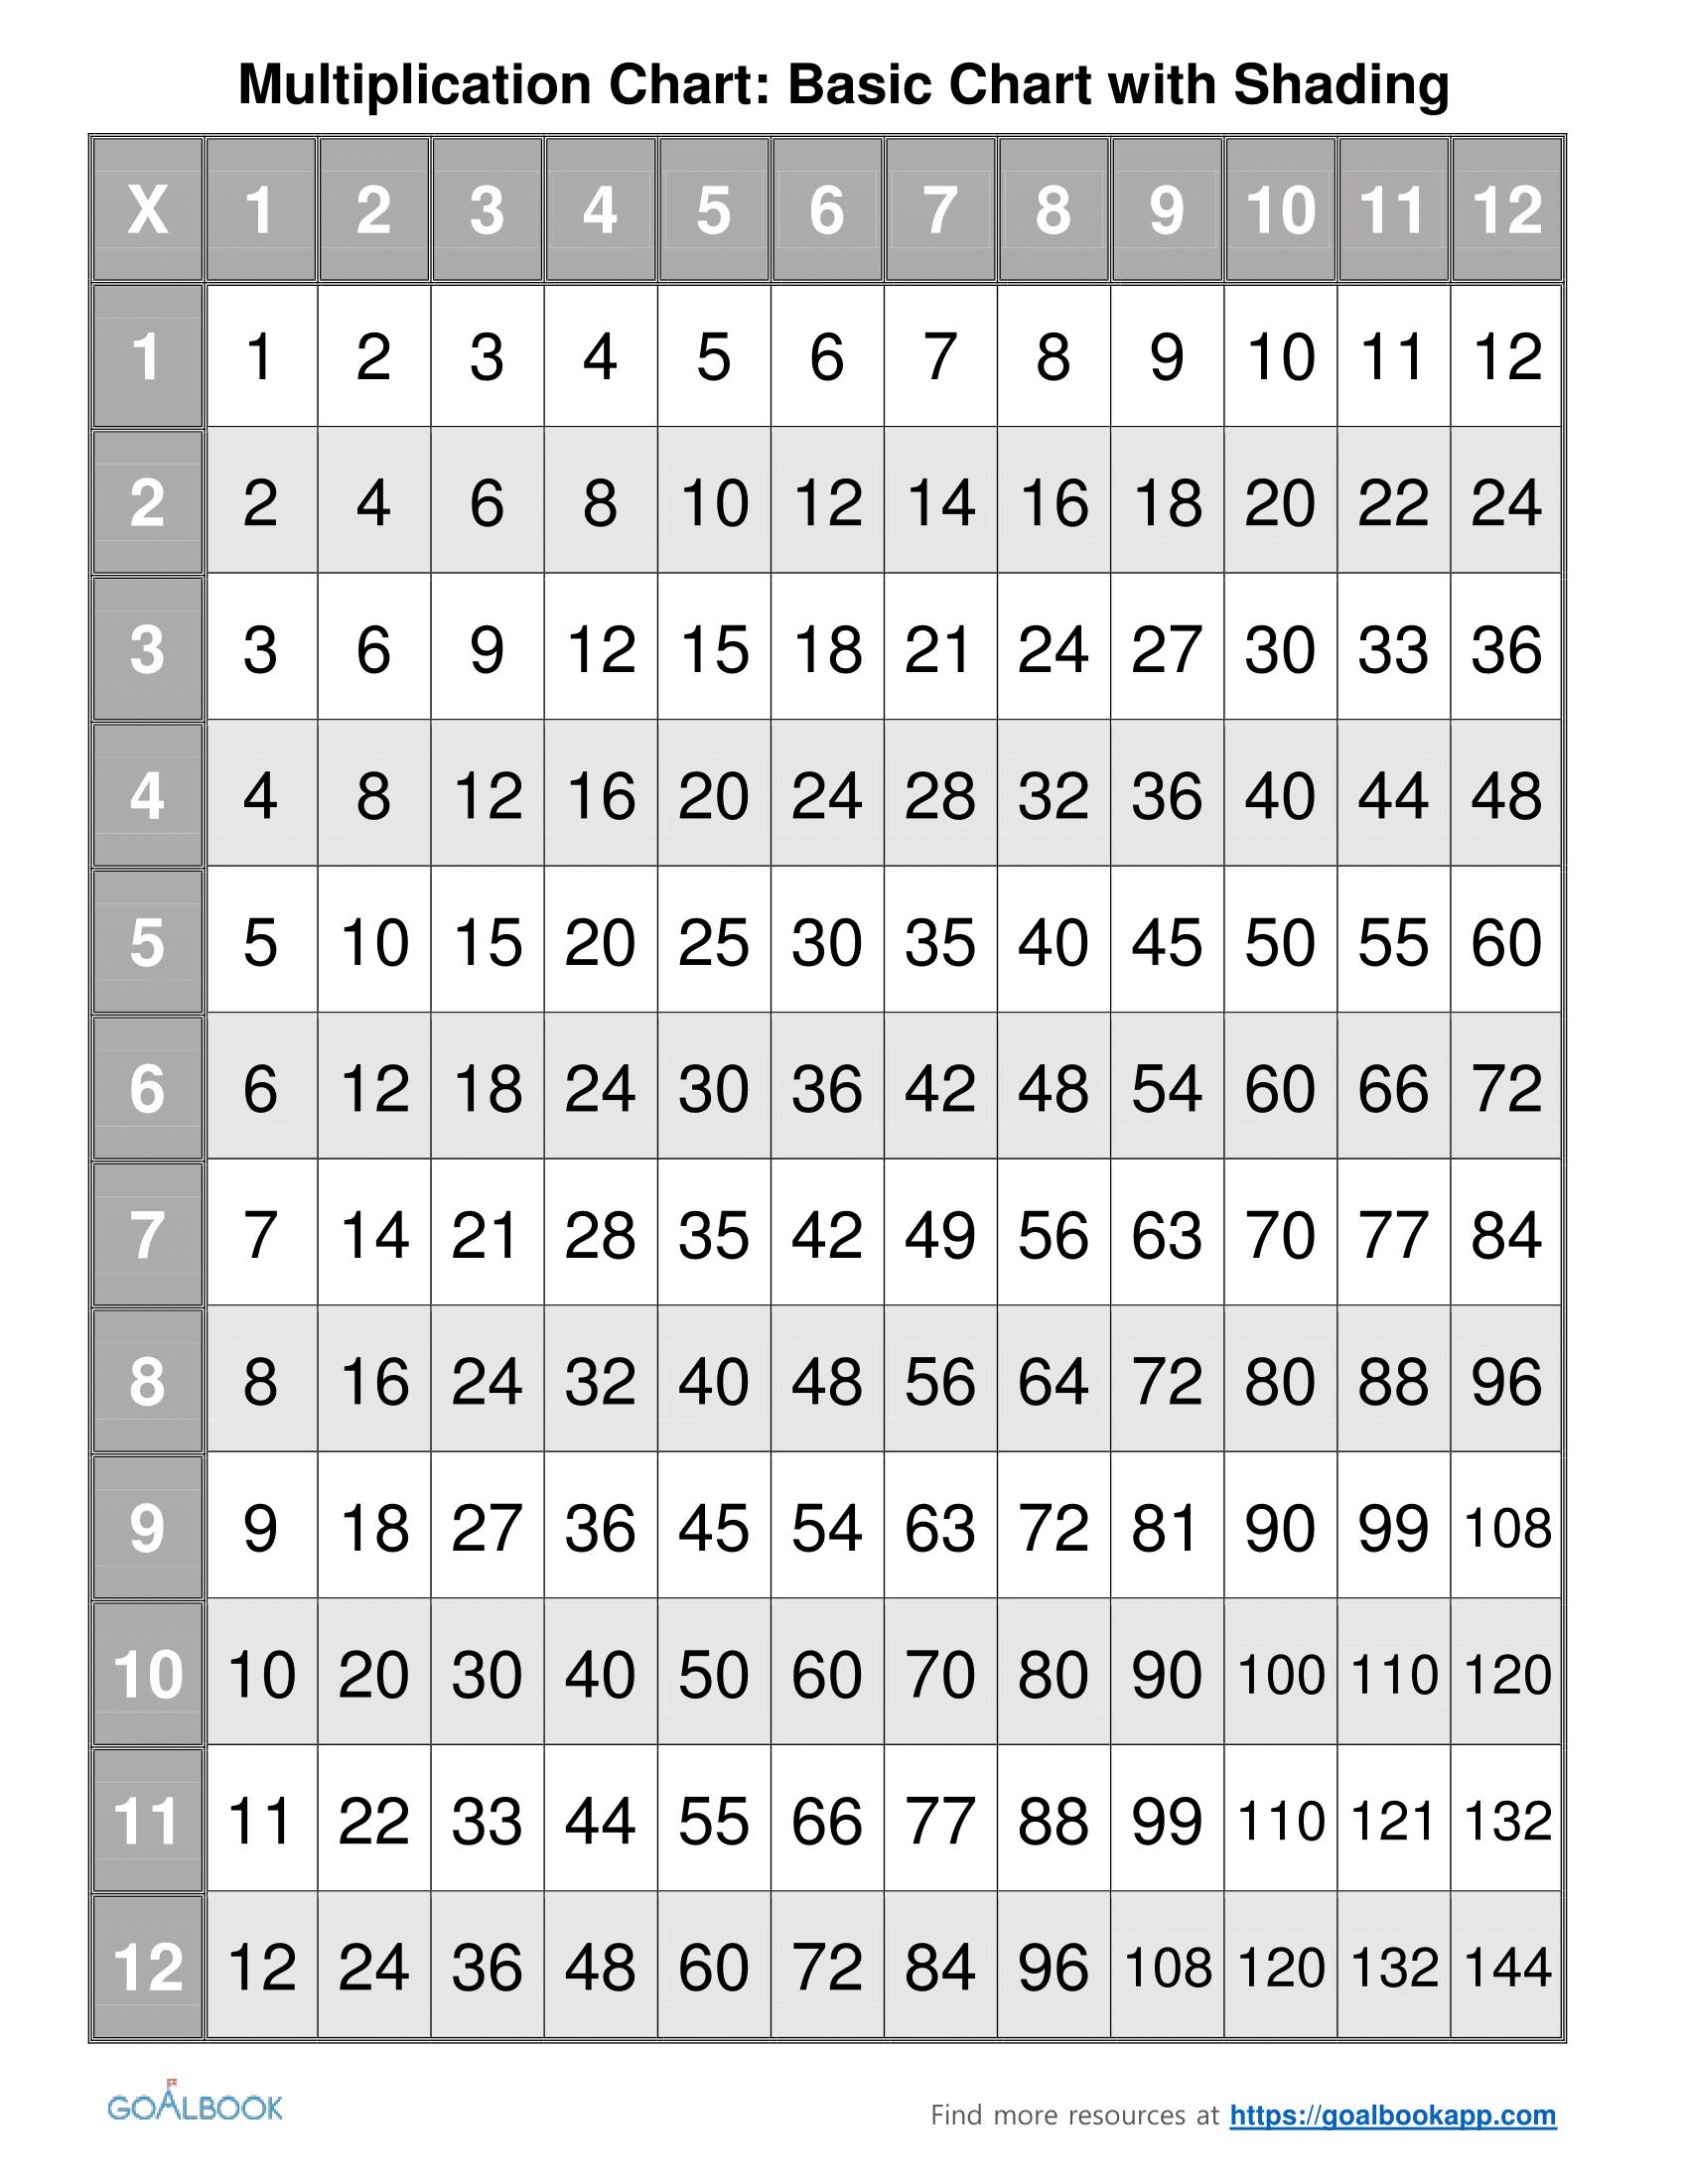 Multiplication Chart - Photos1